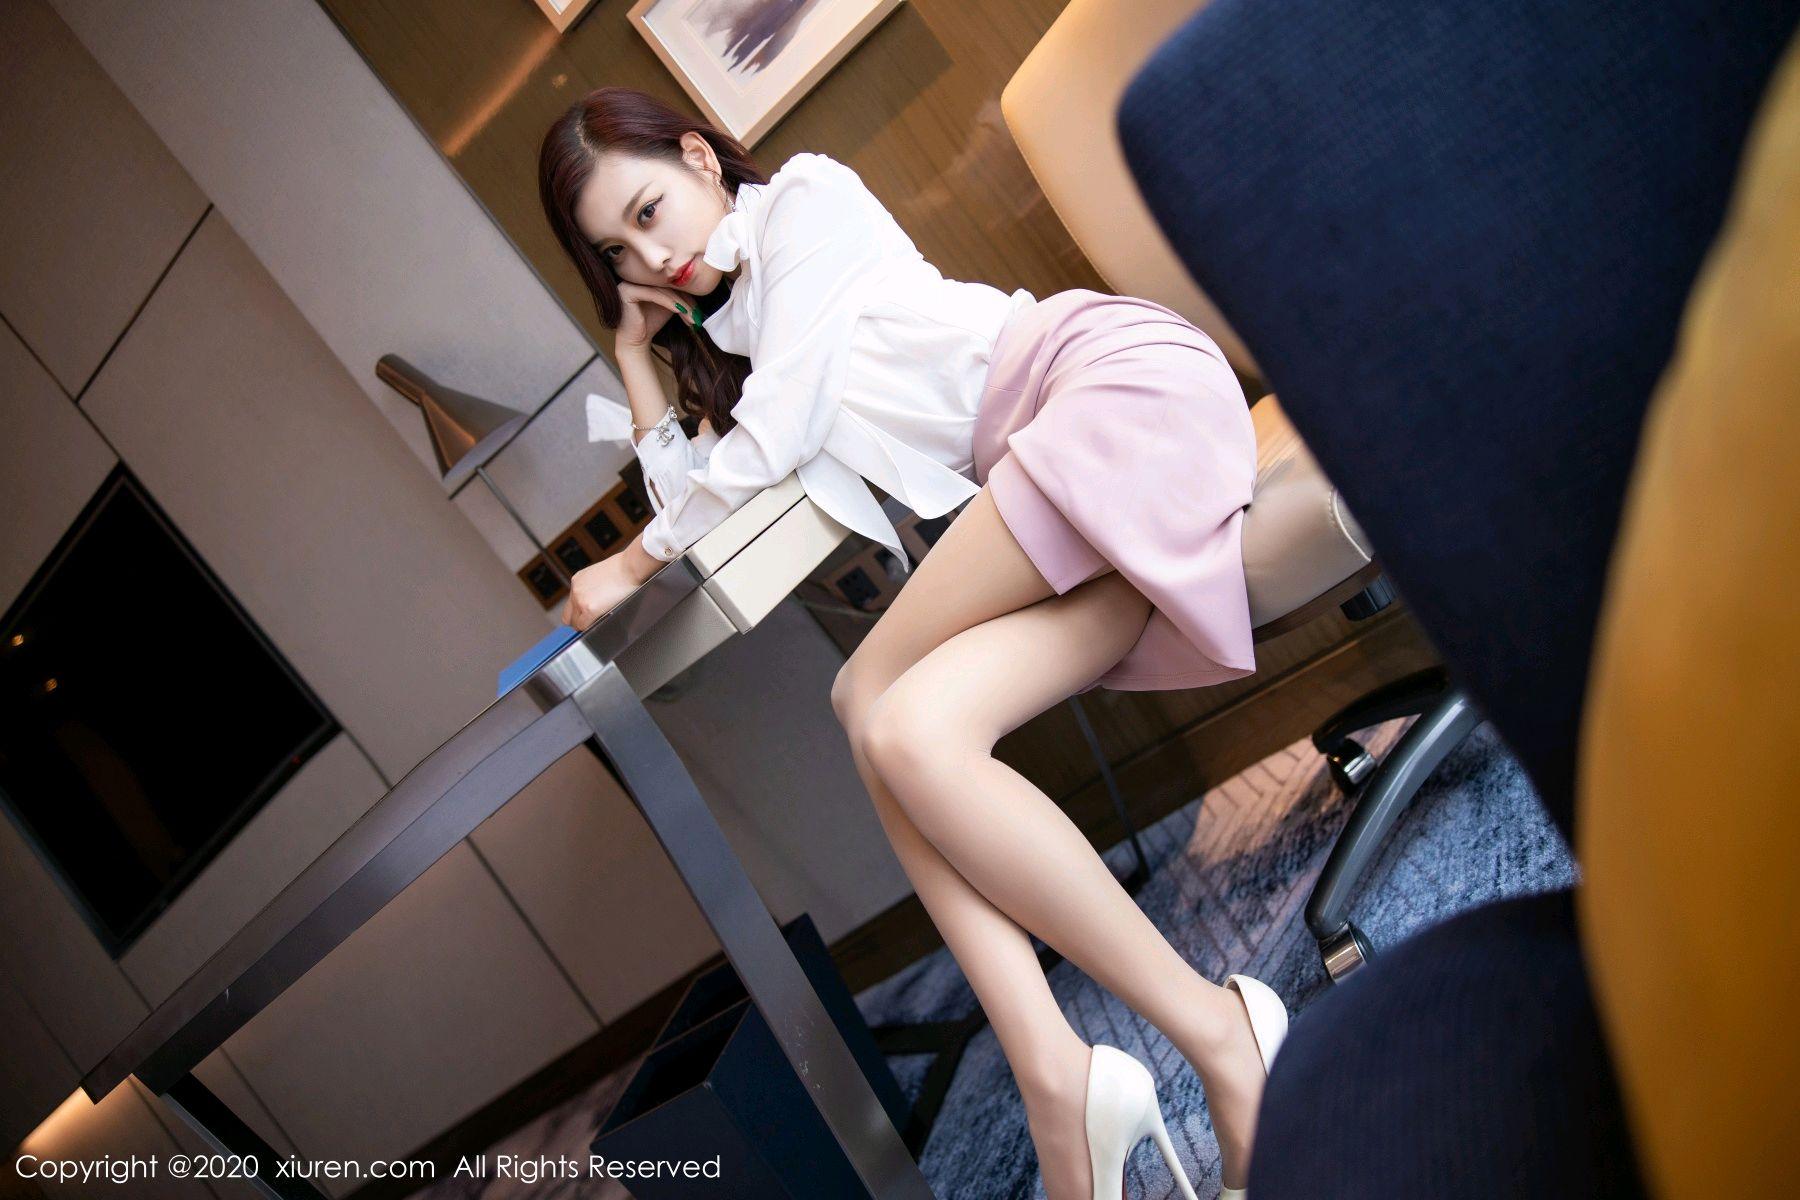 [XiuRen] Vol.2431 Yang Chen Chen 48P, Tall, Underwear, Uniform, Xiuren, Yang Chen Chen